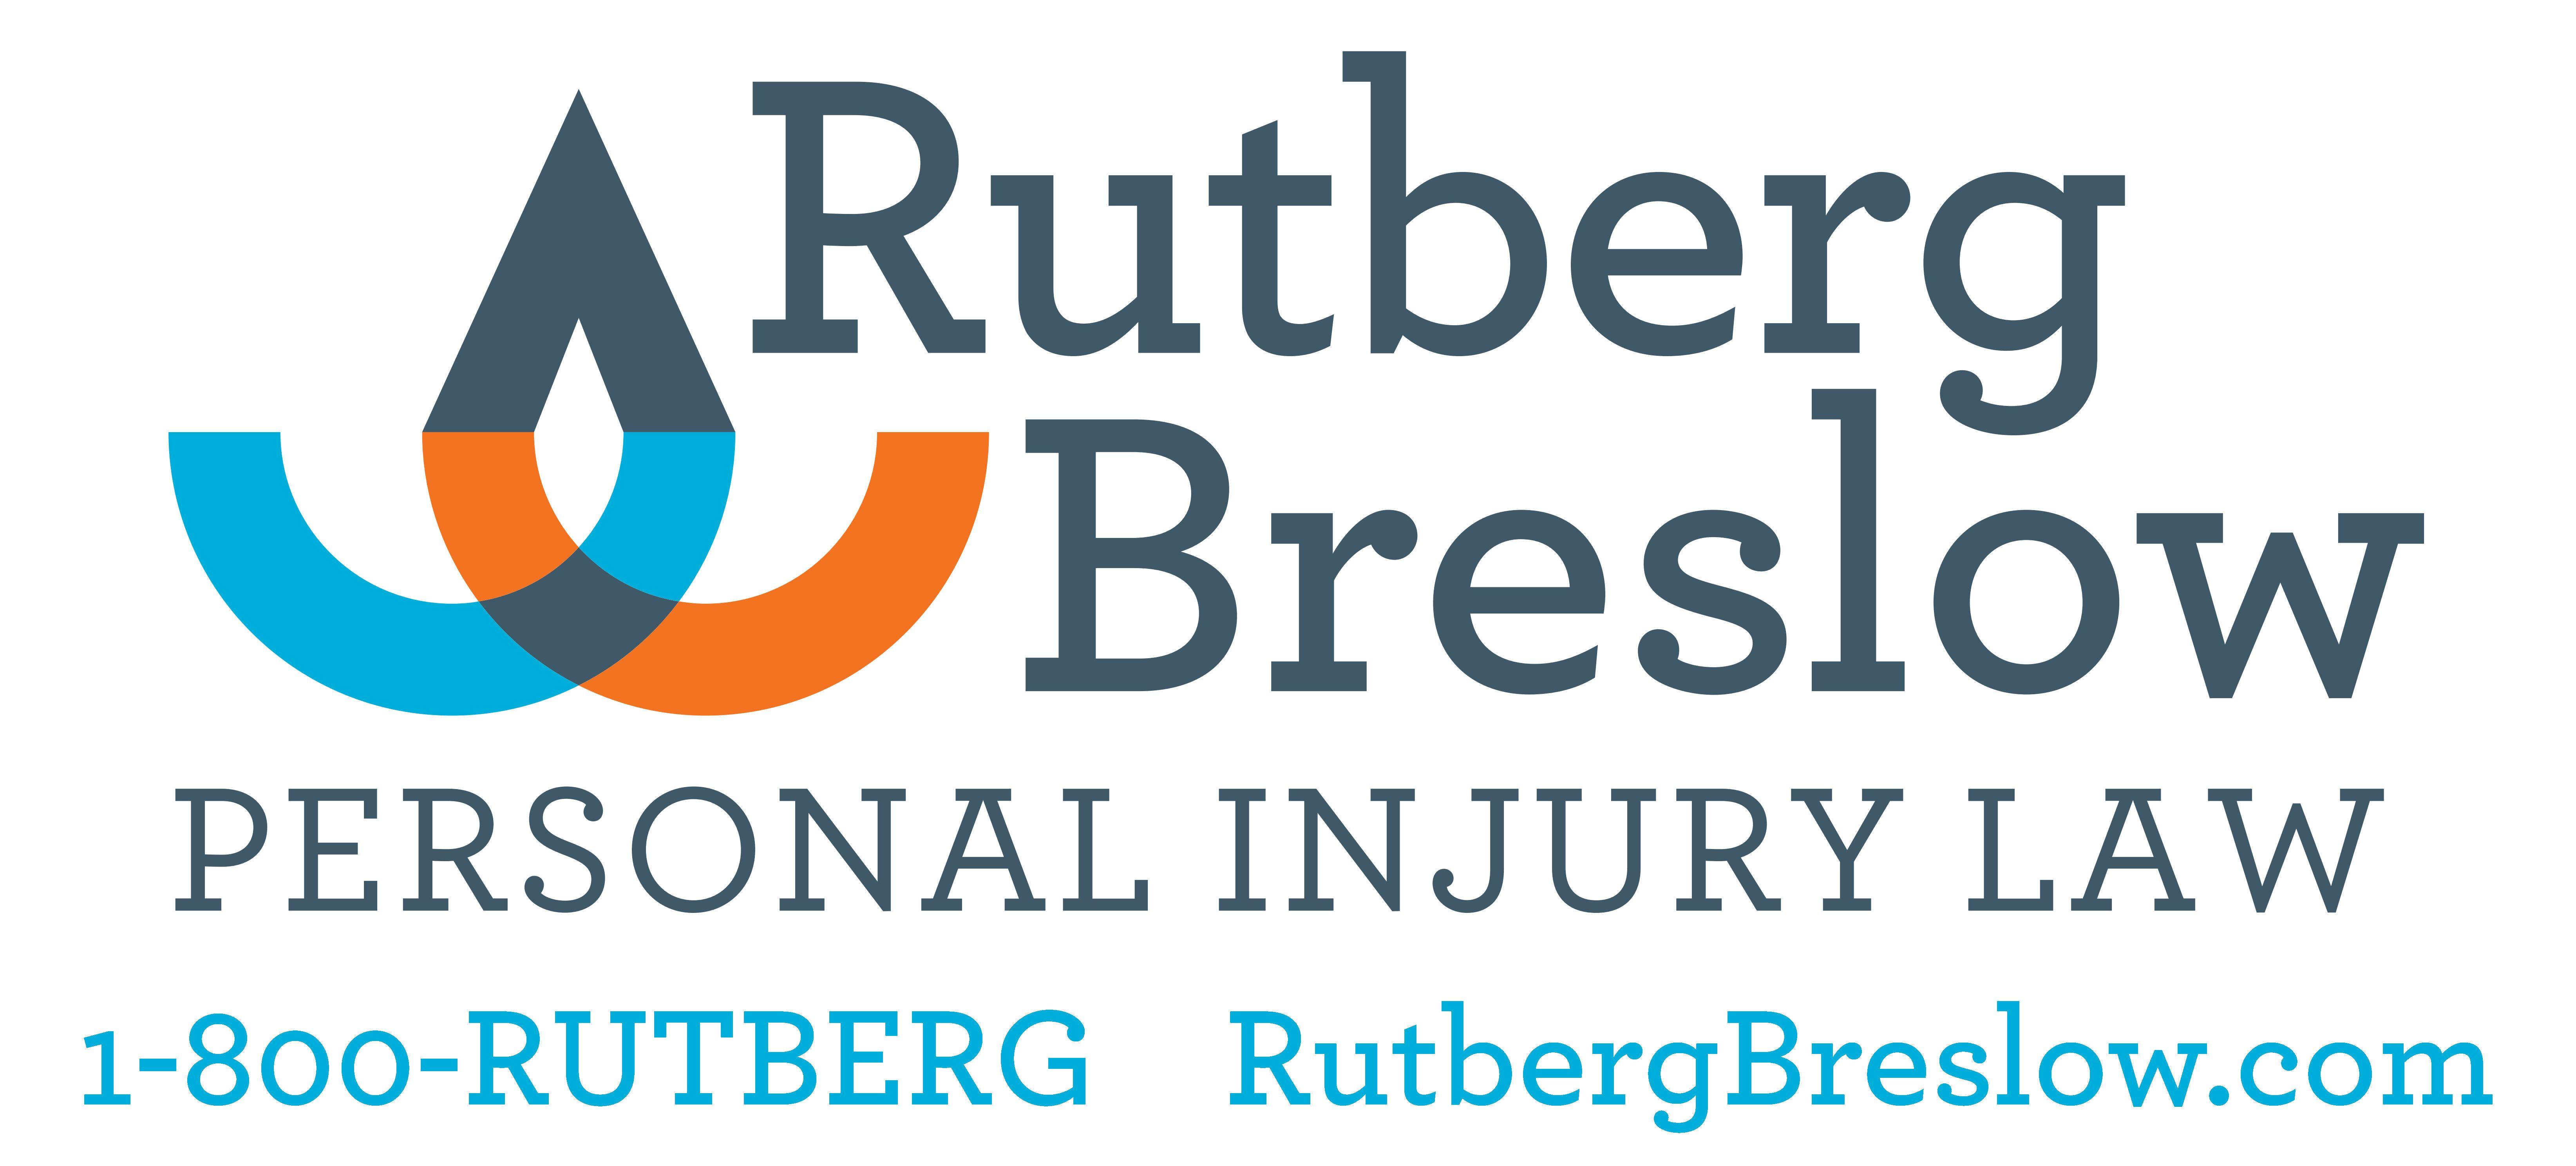 Rutberg Breslow Personal Injury Law logo